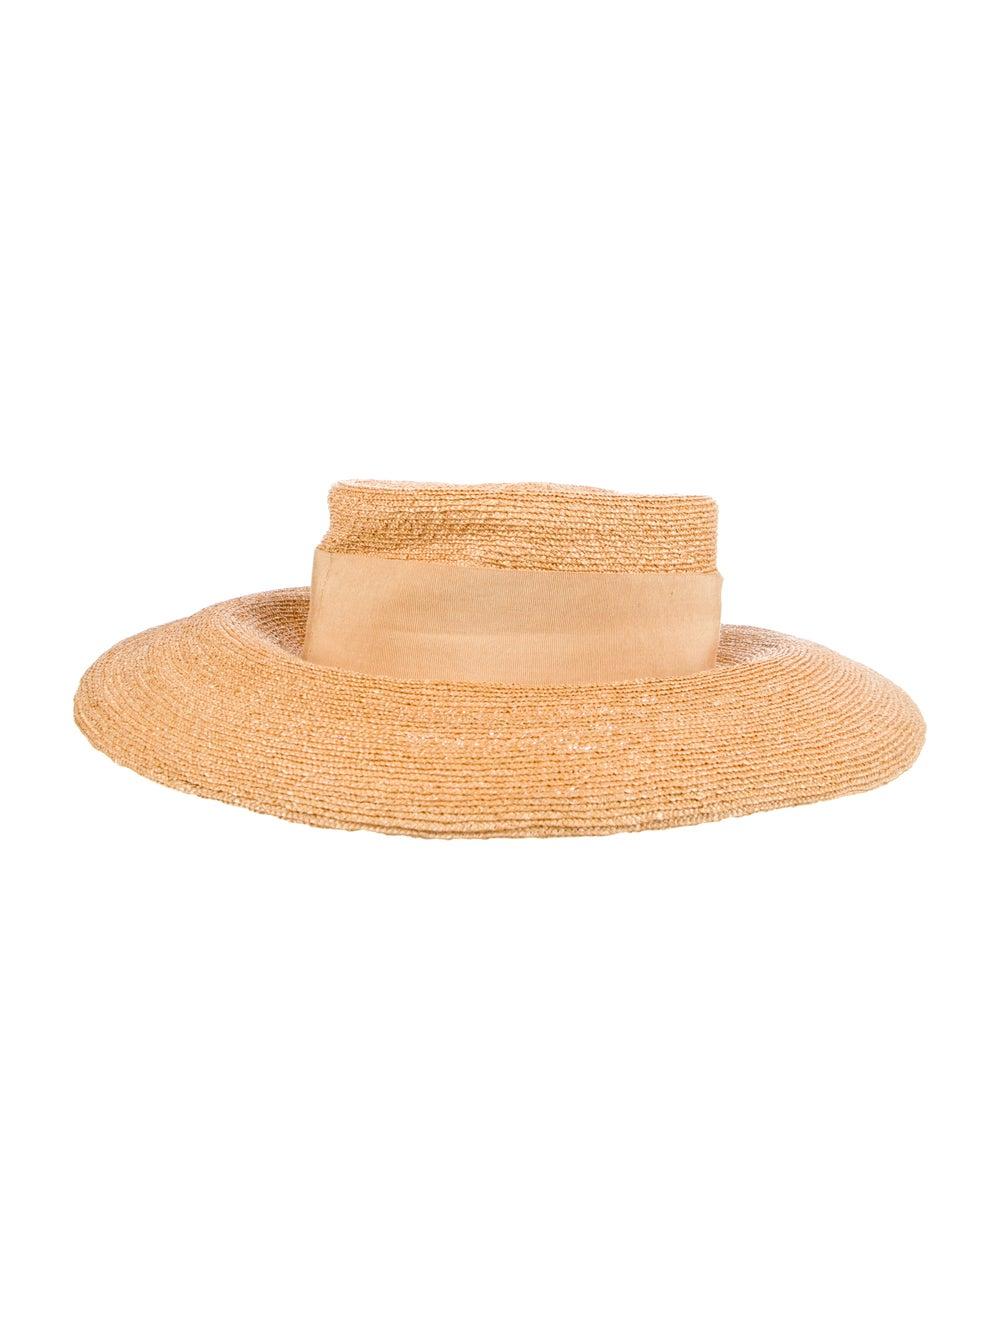 Chanel Straw Wide Brim Hat Tan - image 2